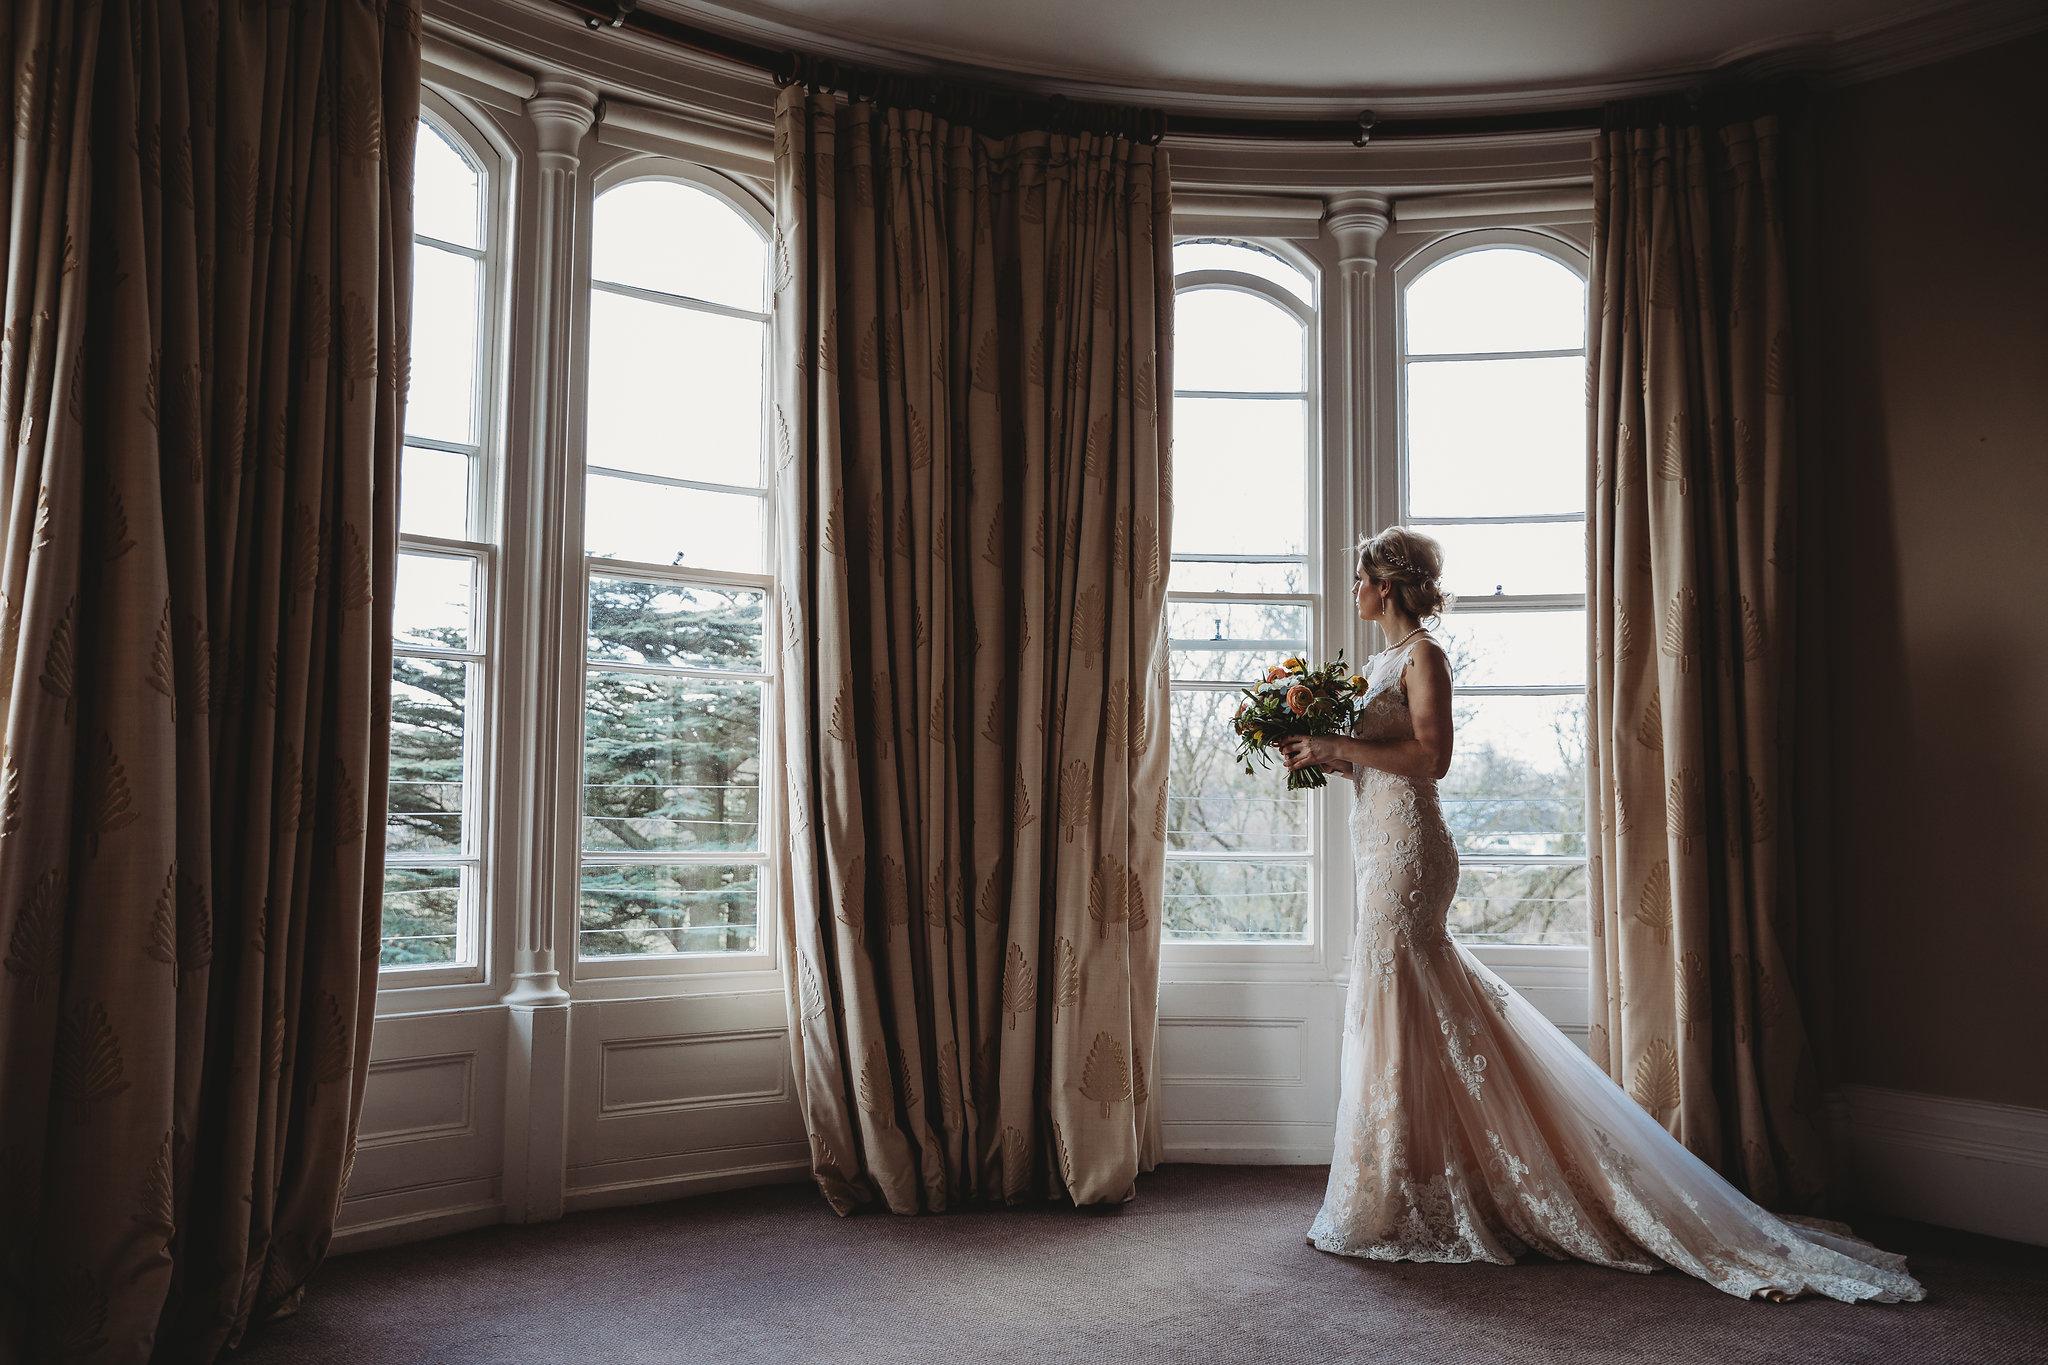 Wedding Hotel Felix cambridgeshire